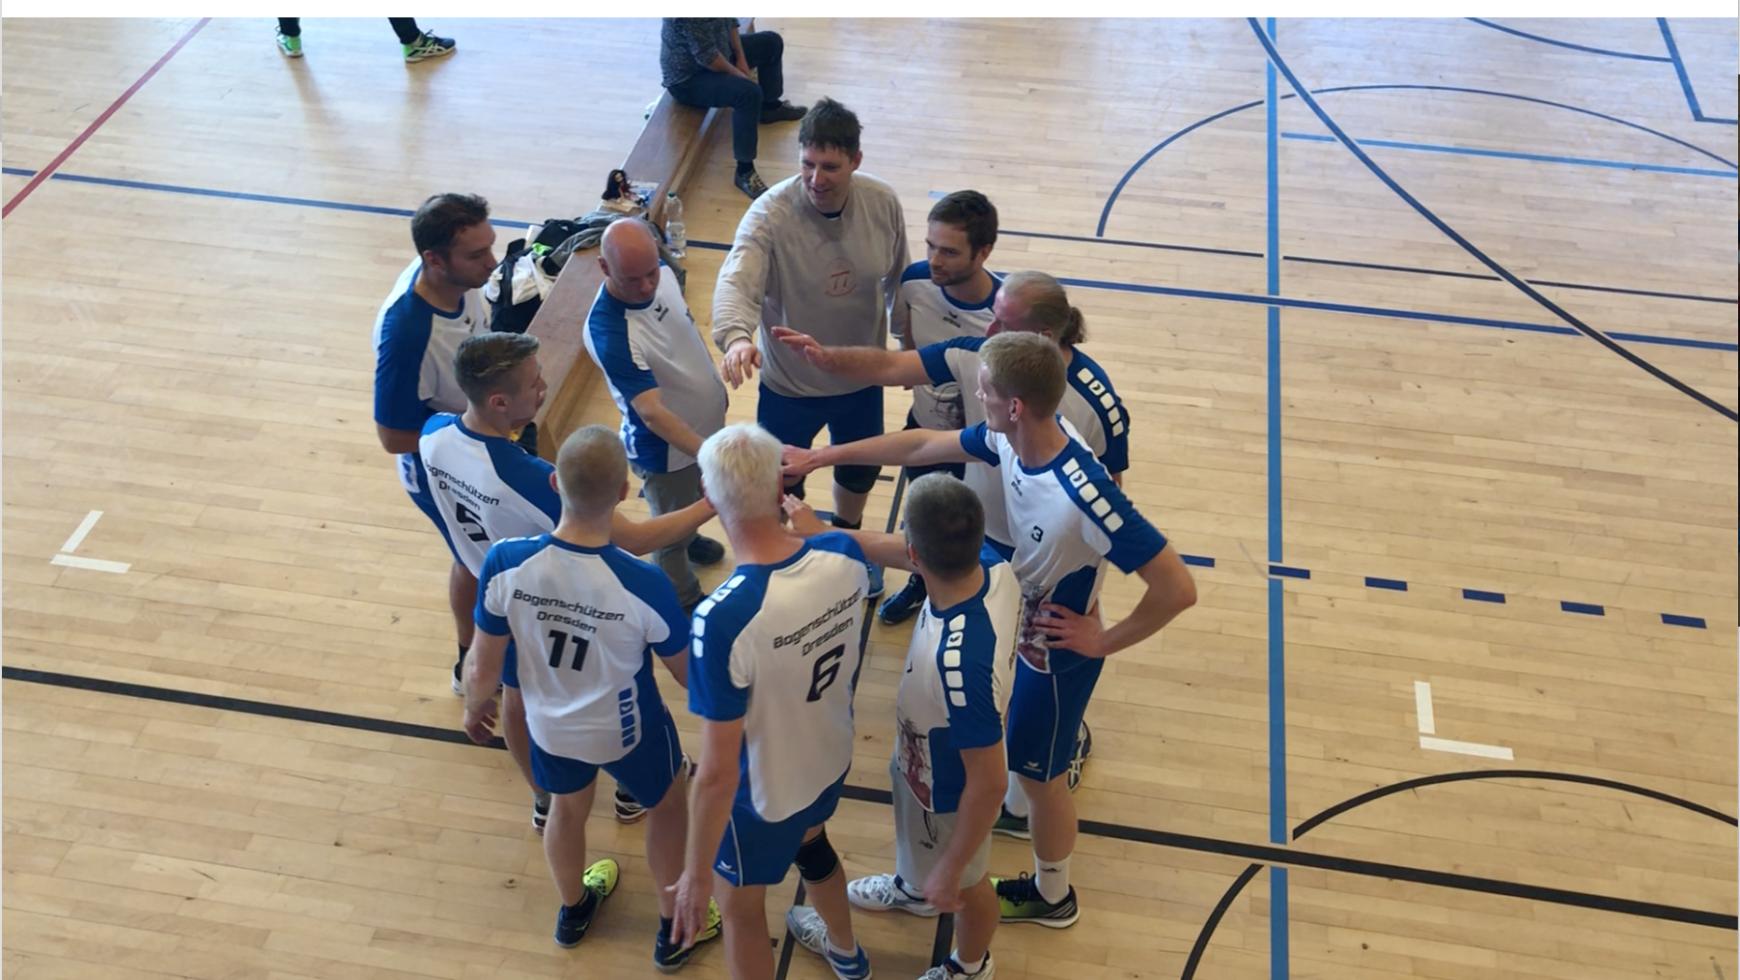 CSD Volleyball-Training